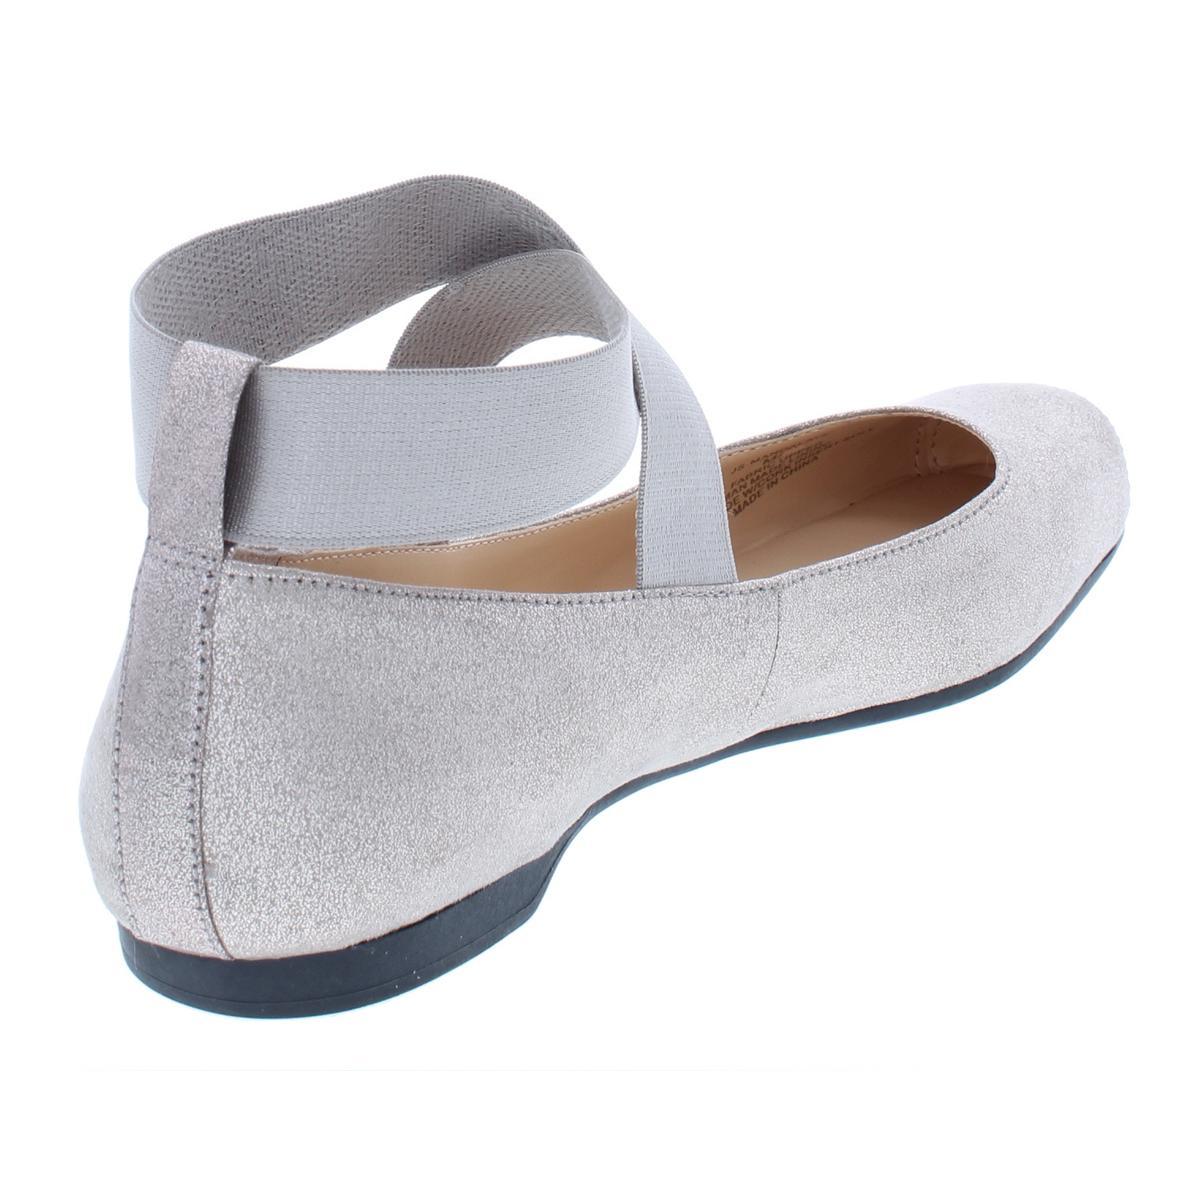 Jessica-Simpson-Women-039-s-Mandalaye-Square-Toe-Ankle-Wrap-Ballet-Flats thumbnail 10